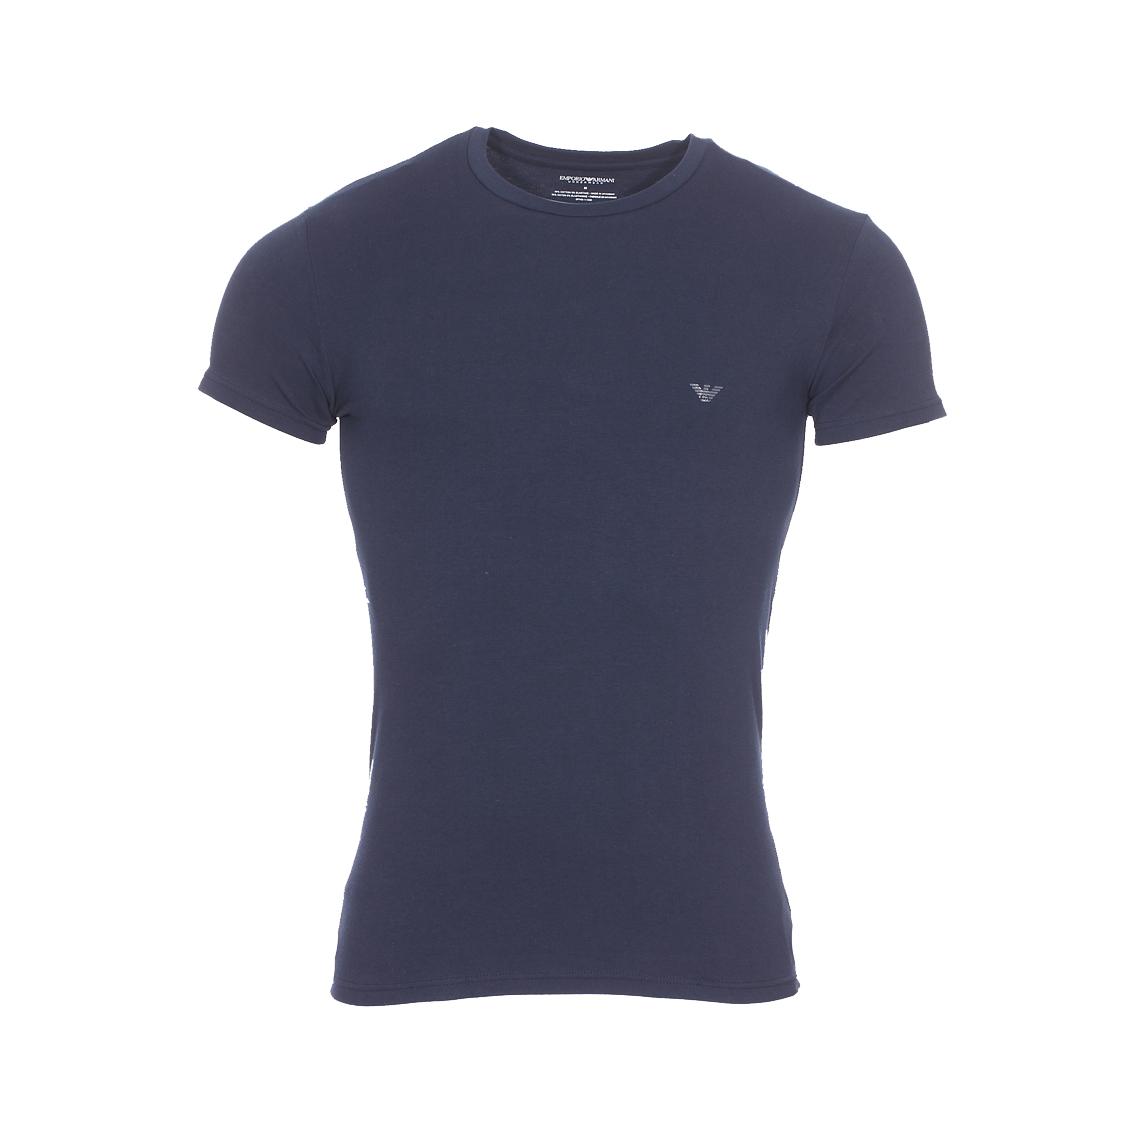 Tee-shirt col rond  en coton stretch bleu marine floqué en gris